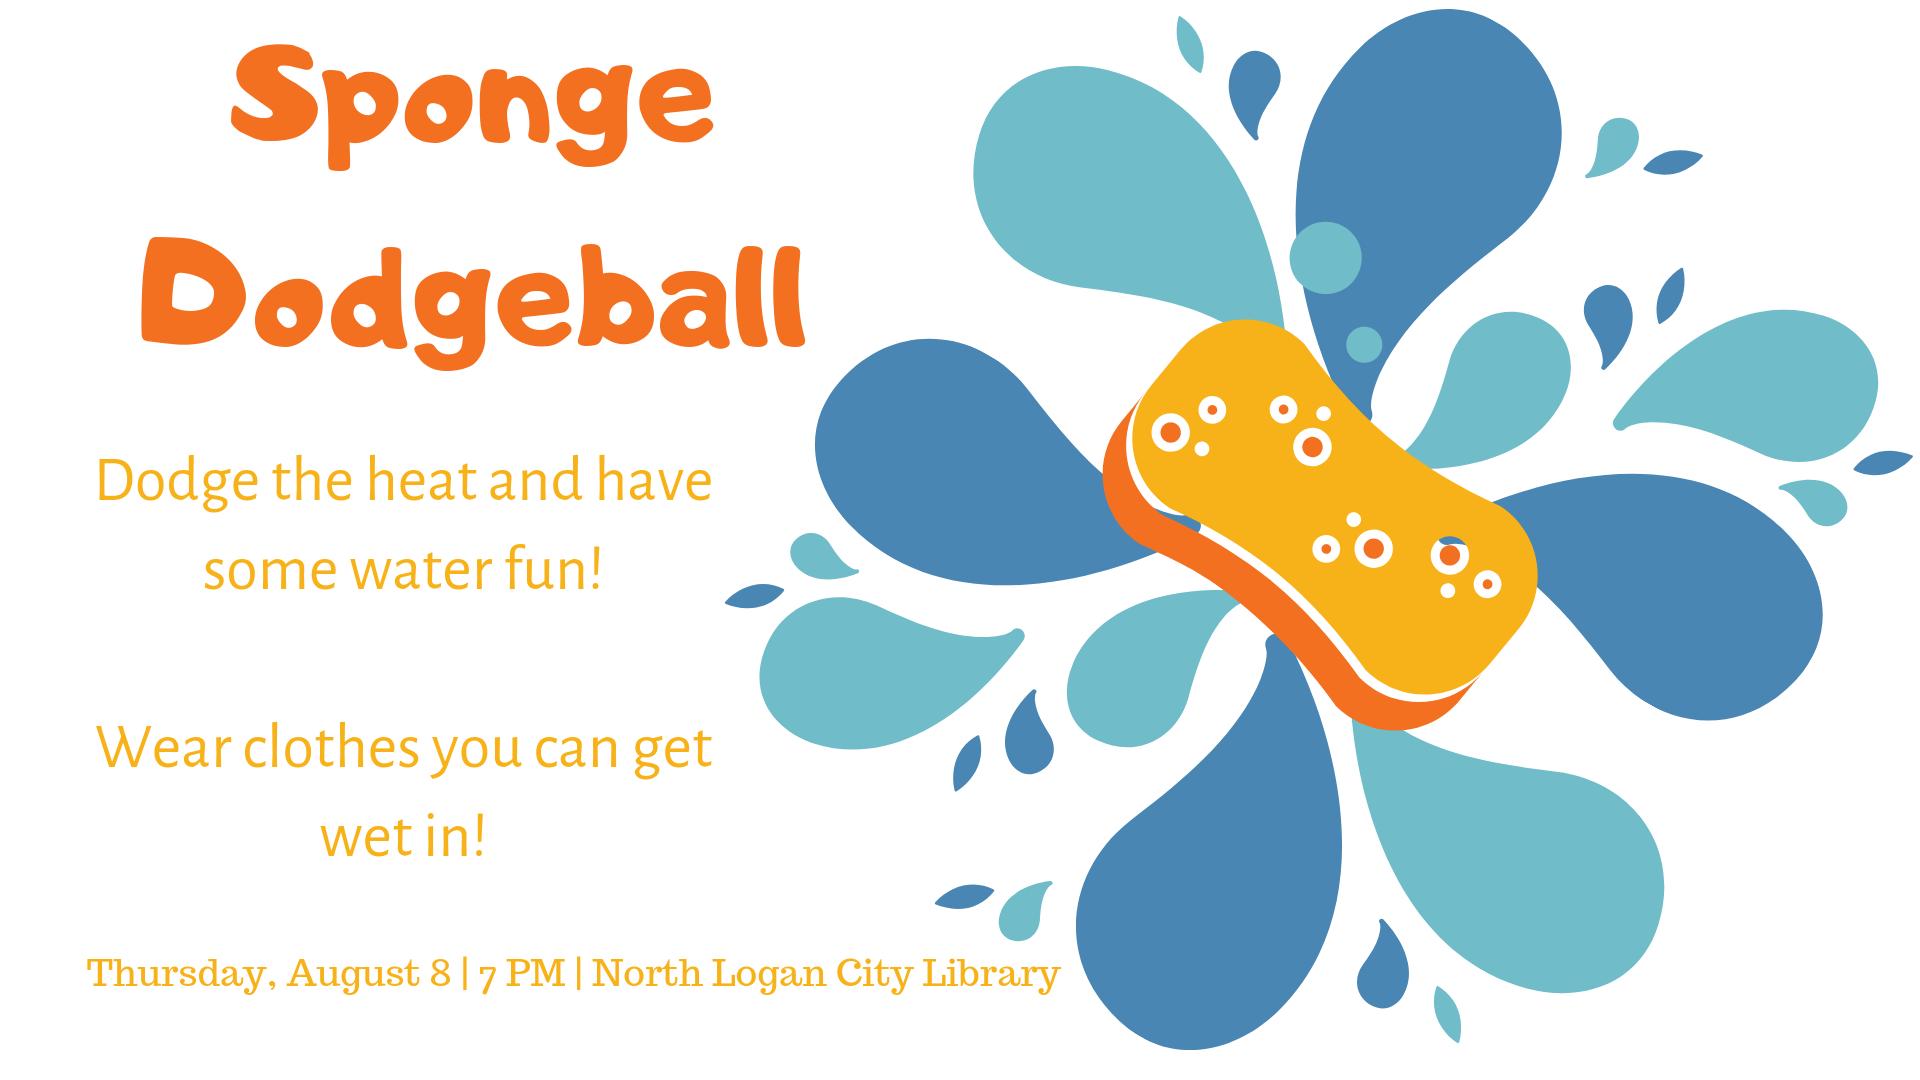 Sponge Dodgeball